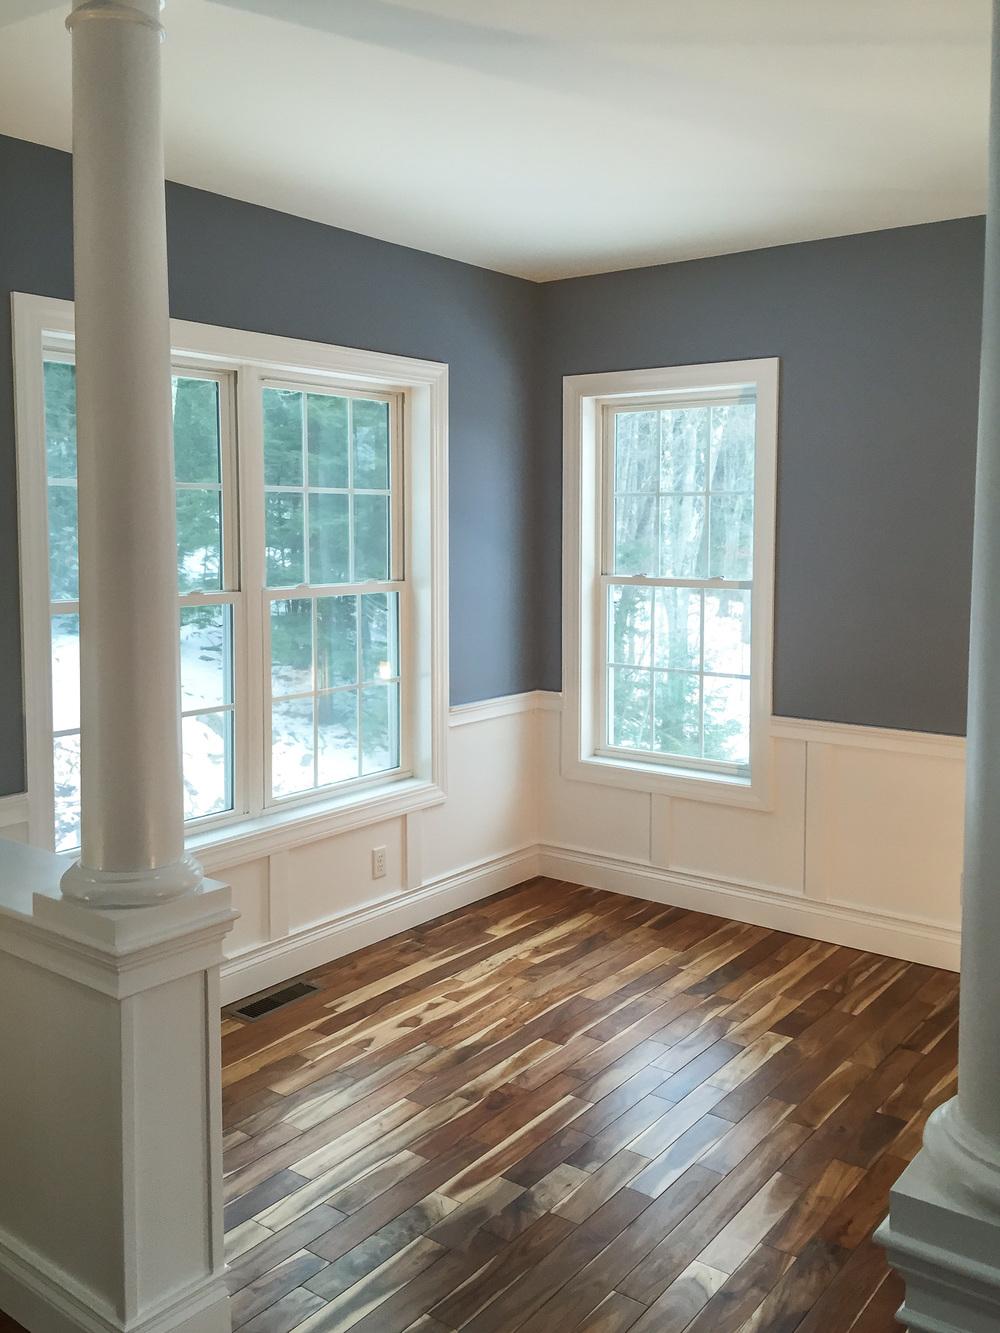 big-dog-painting-interior-floors.jpg